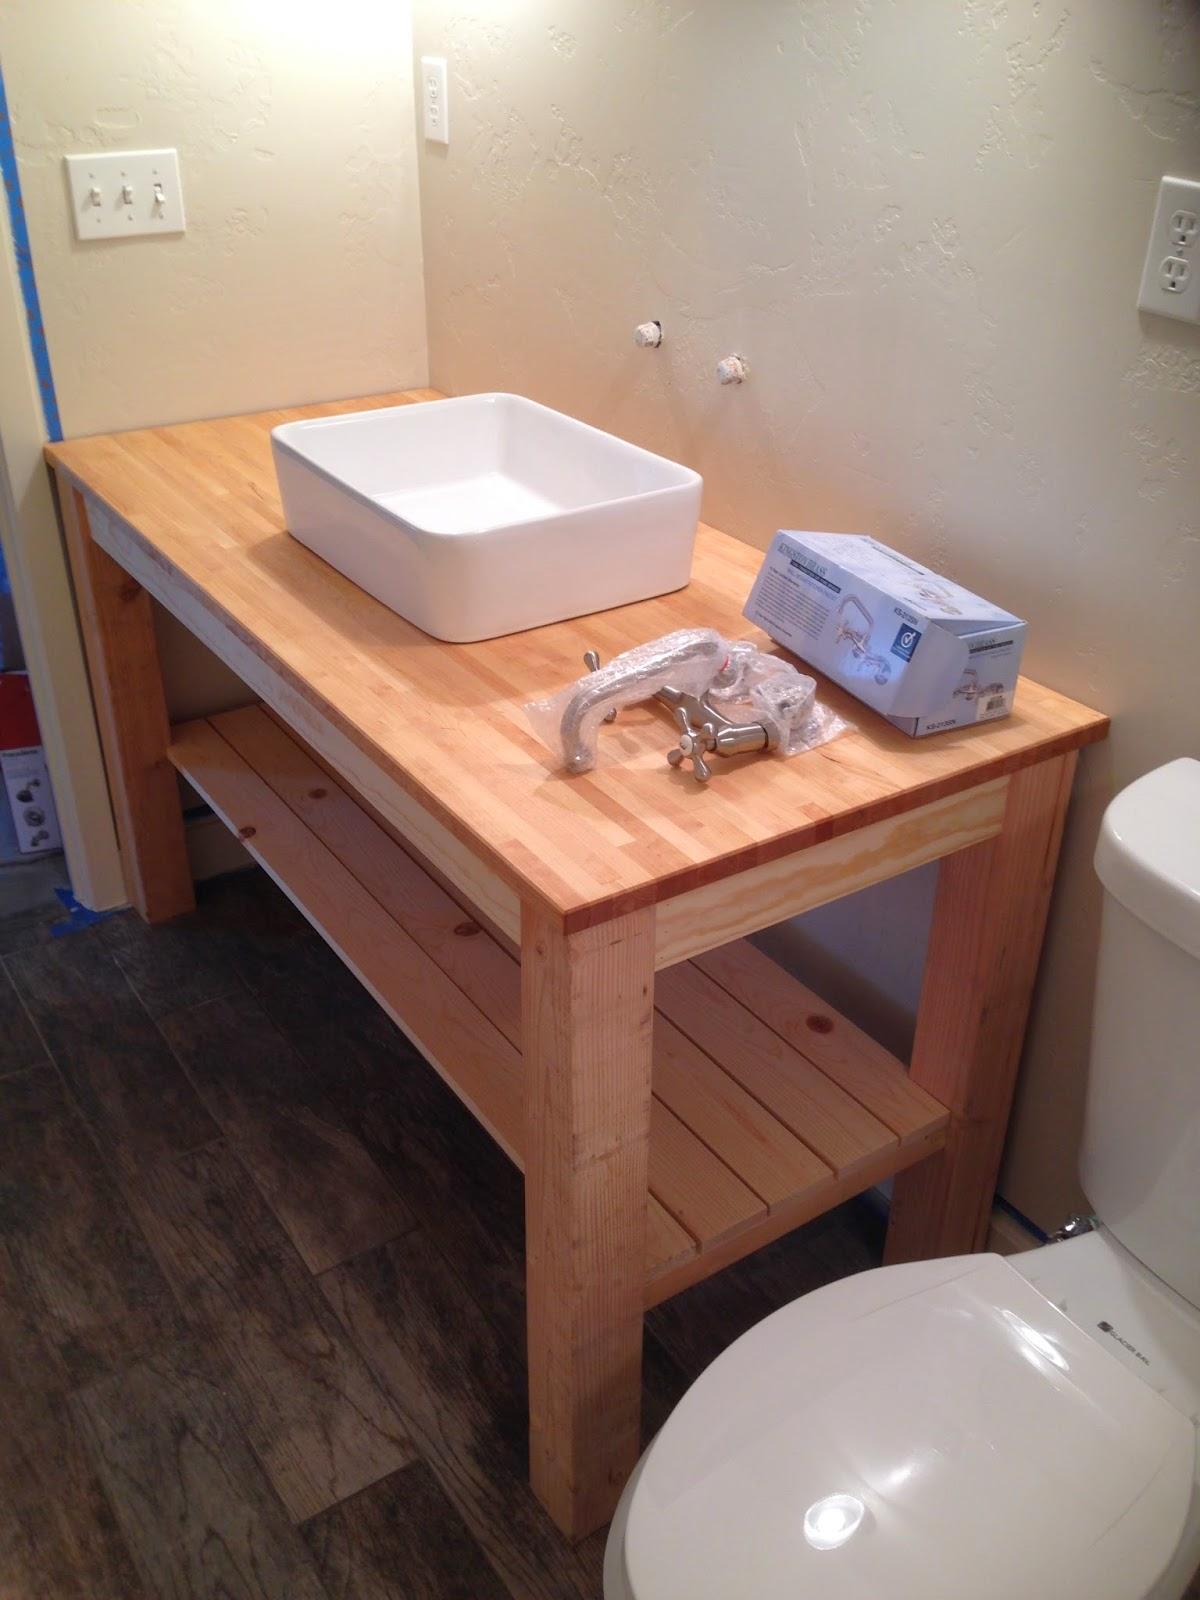 chapman place diy bathroom vanity. Black Bedroom Furniture Sets. Home Design Ideas